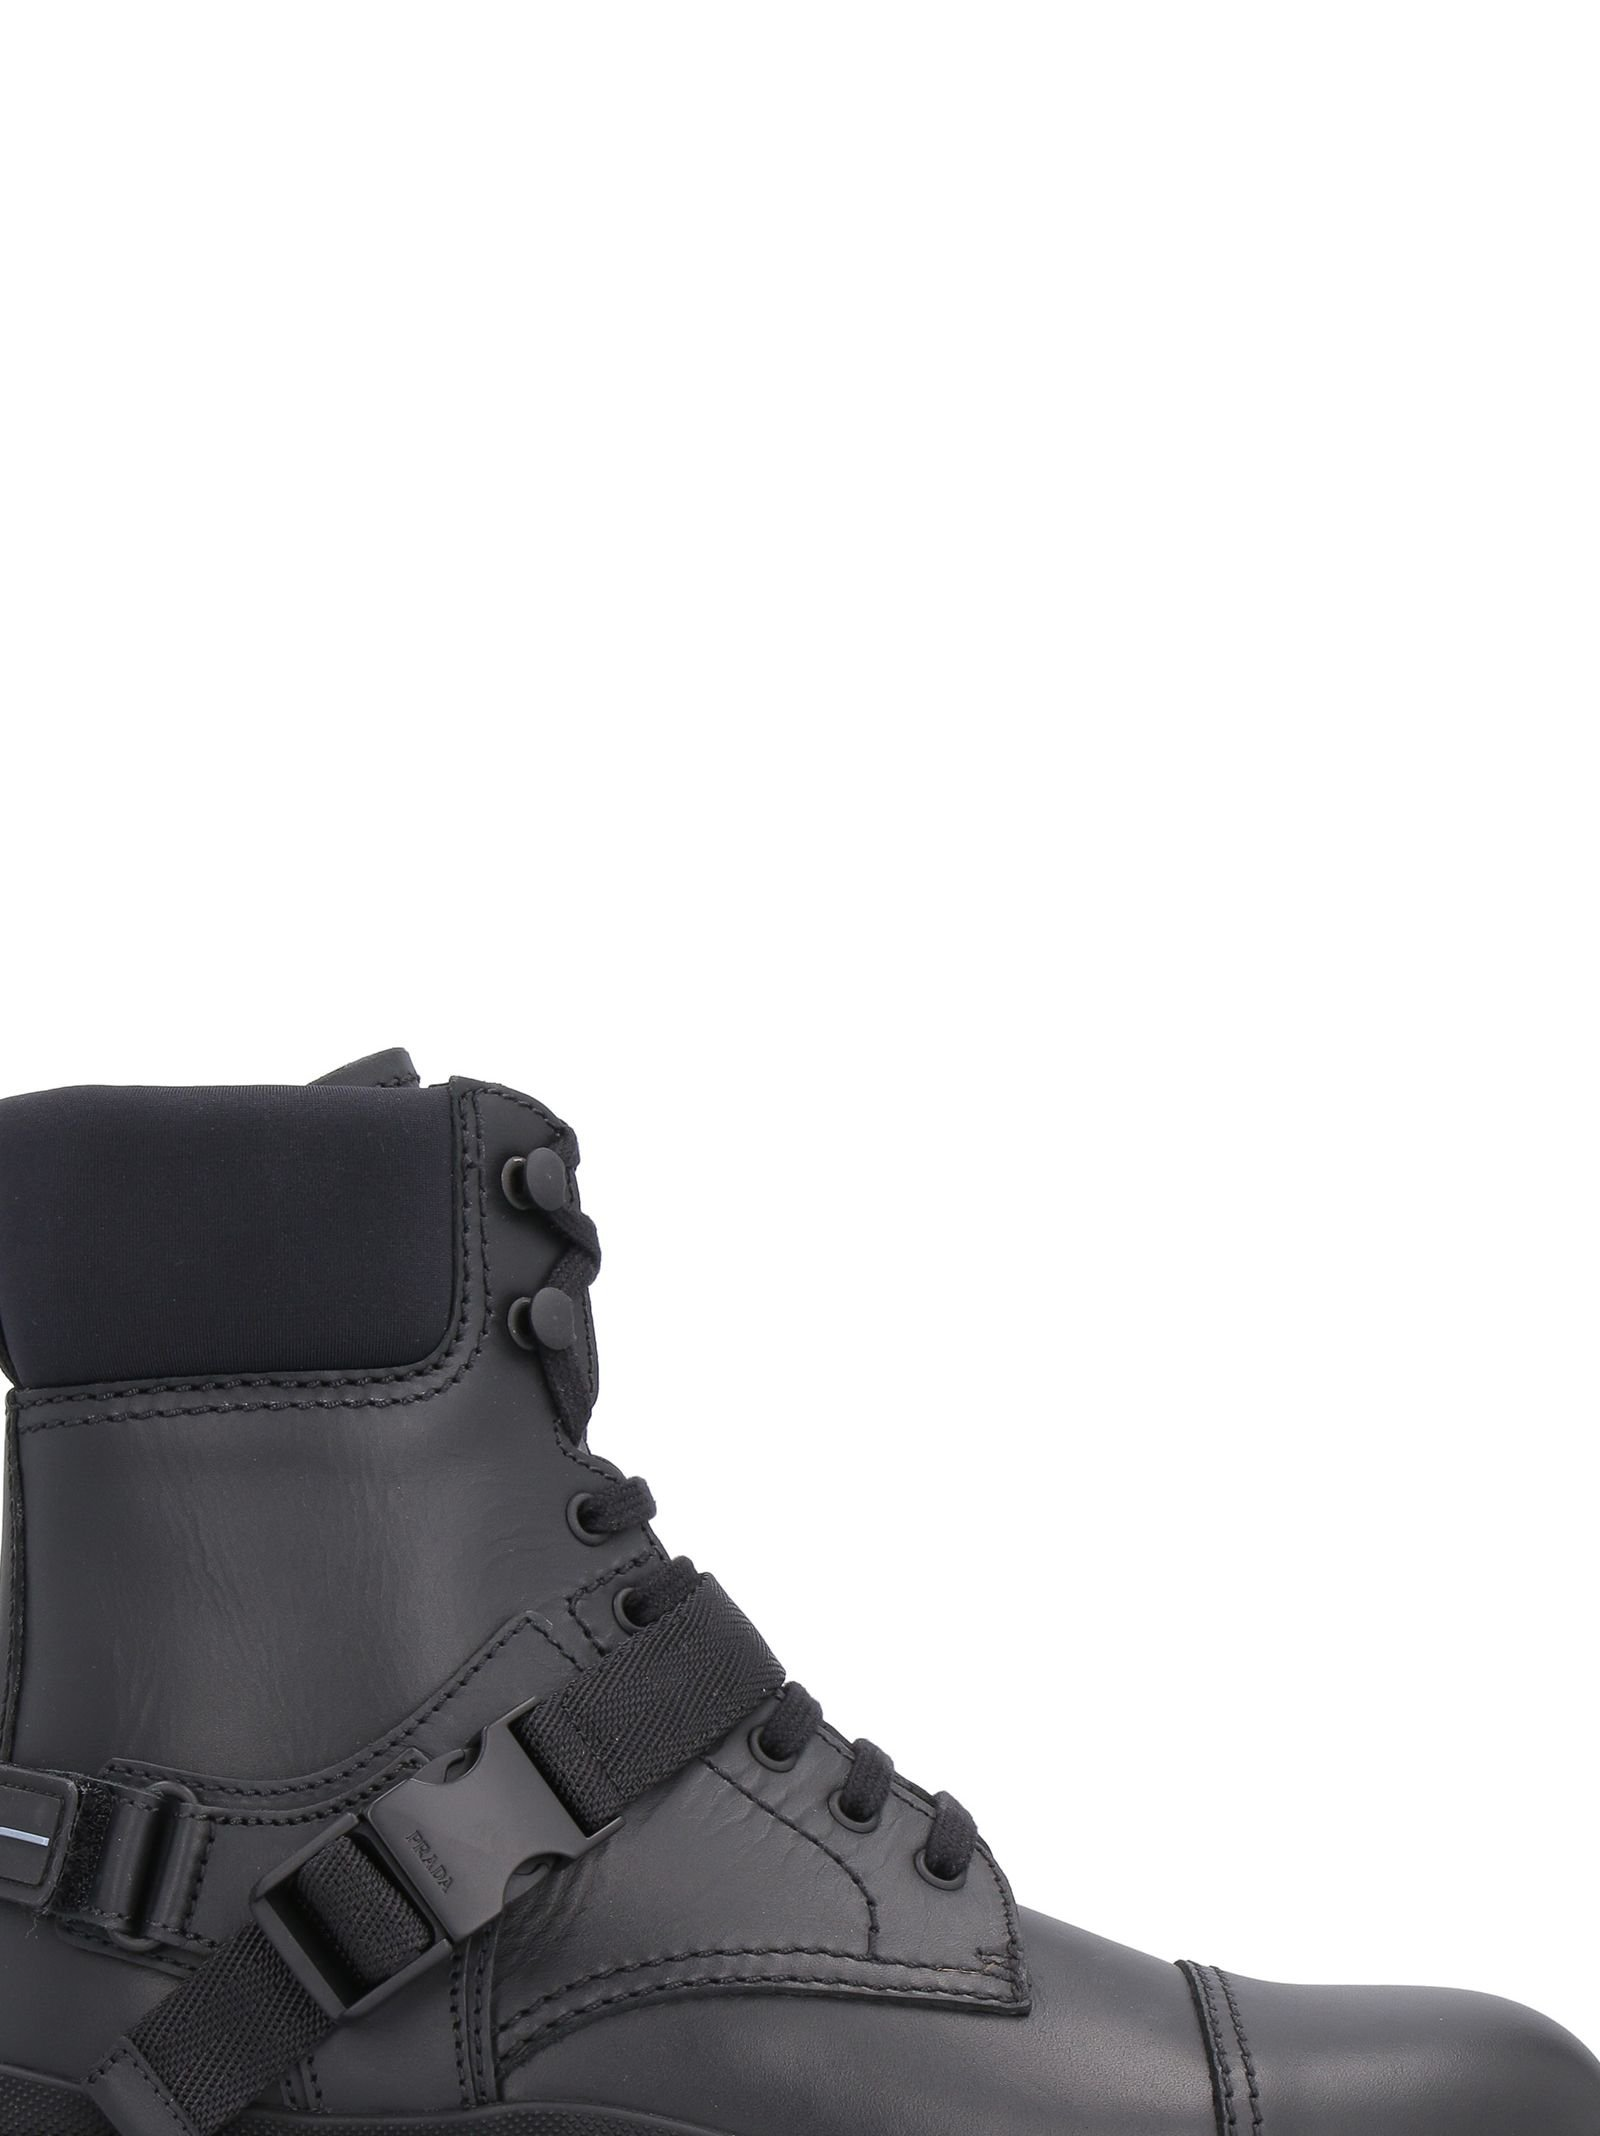 Prada Leather And Neoprene Boots